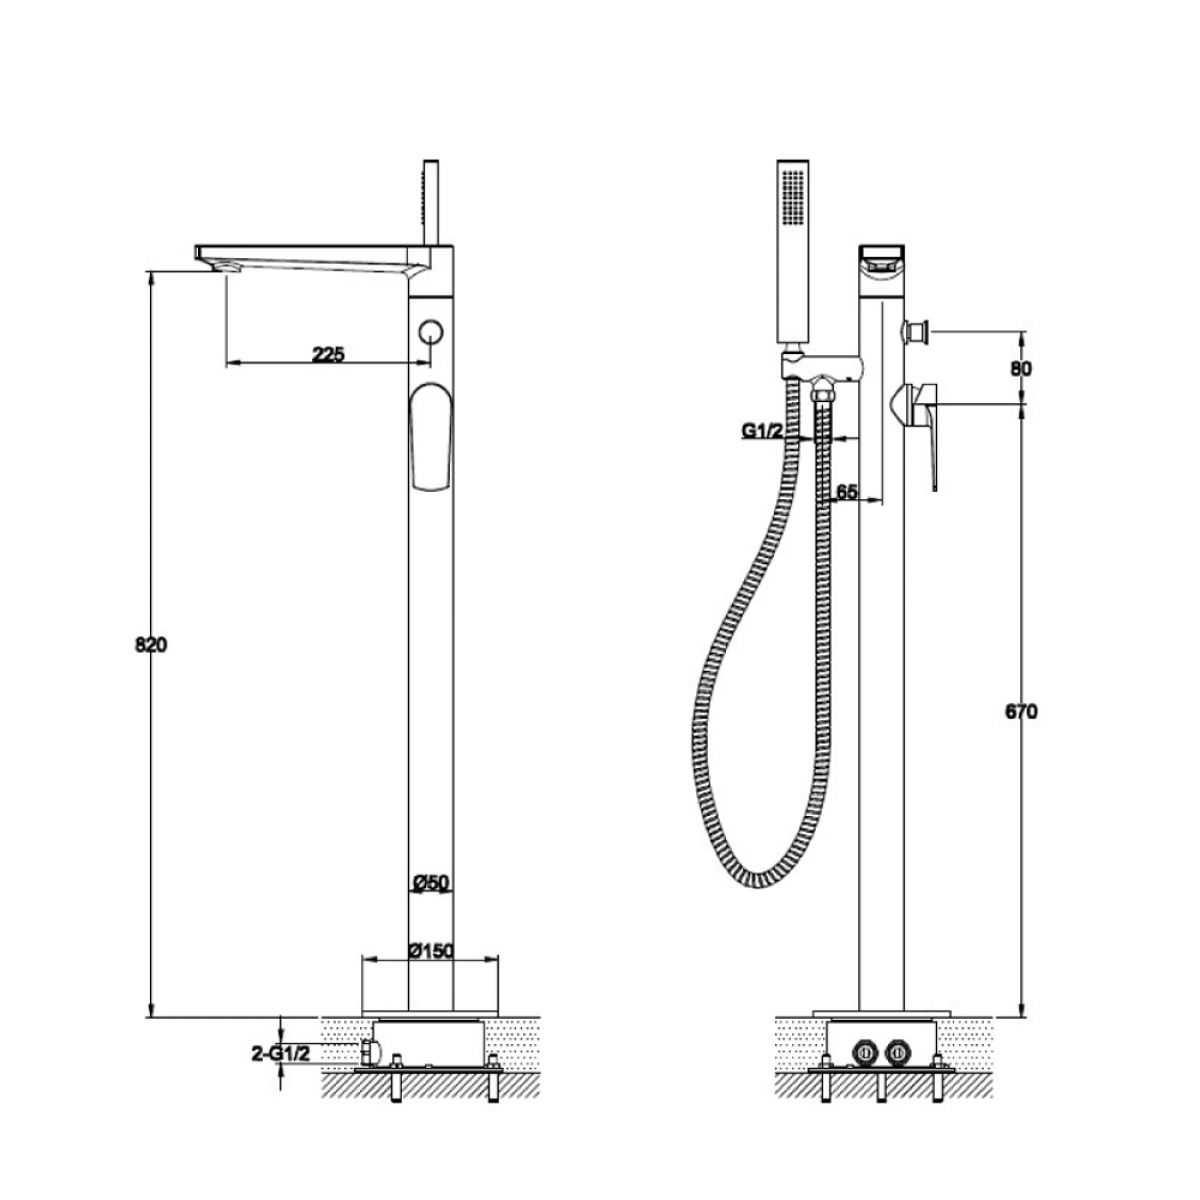 RAK Blade Freestanding Shower Bath Mixer Tap Measurements